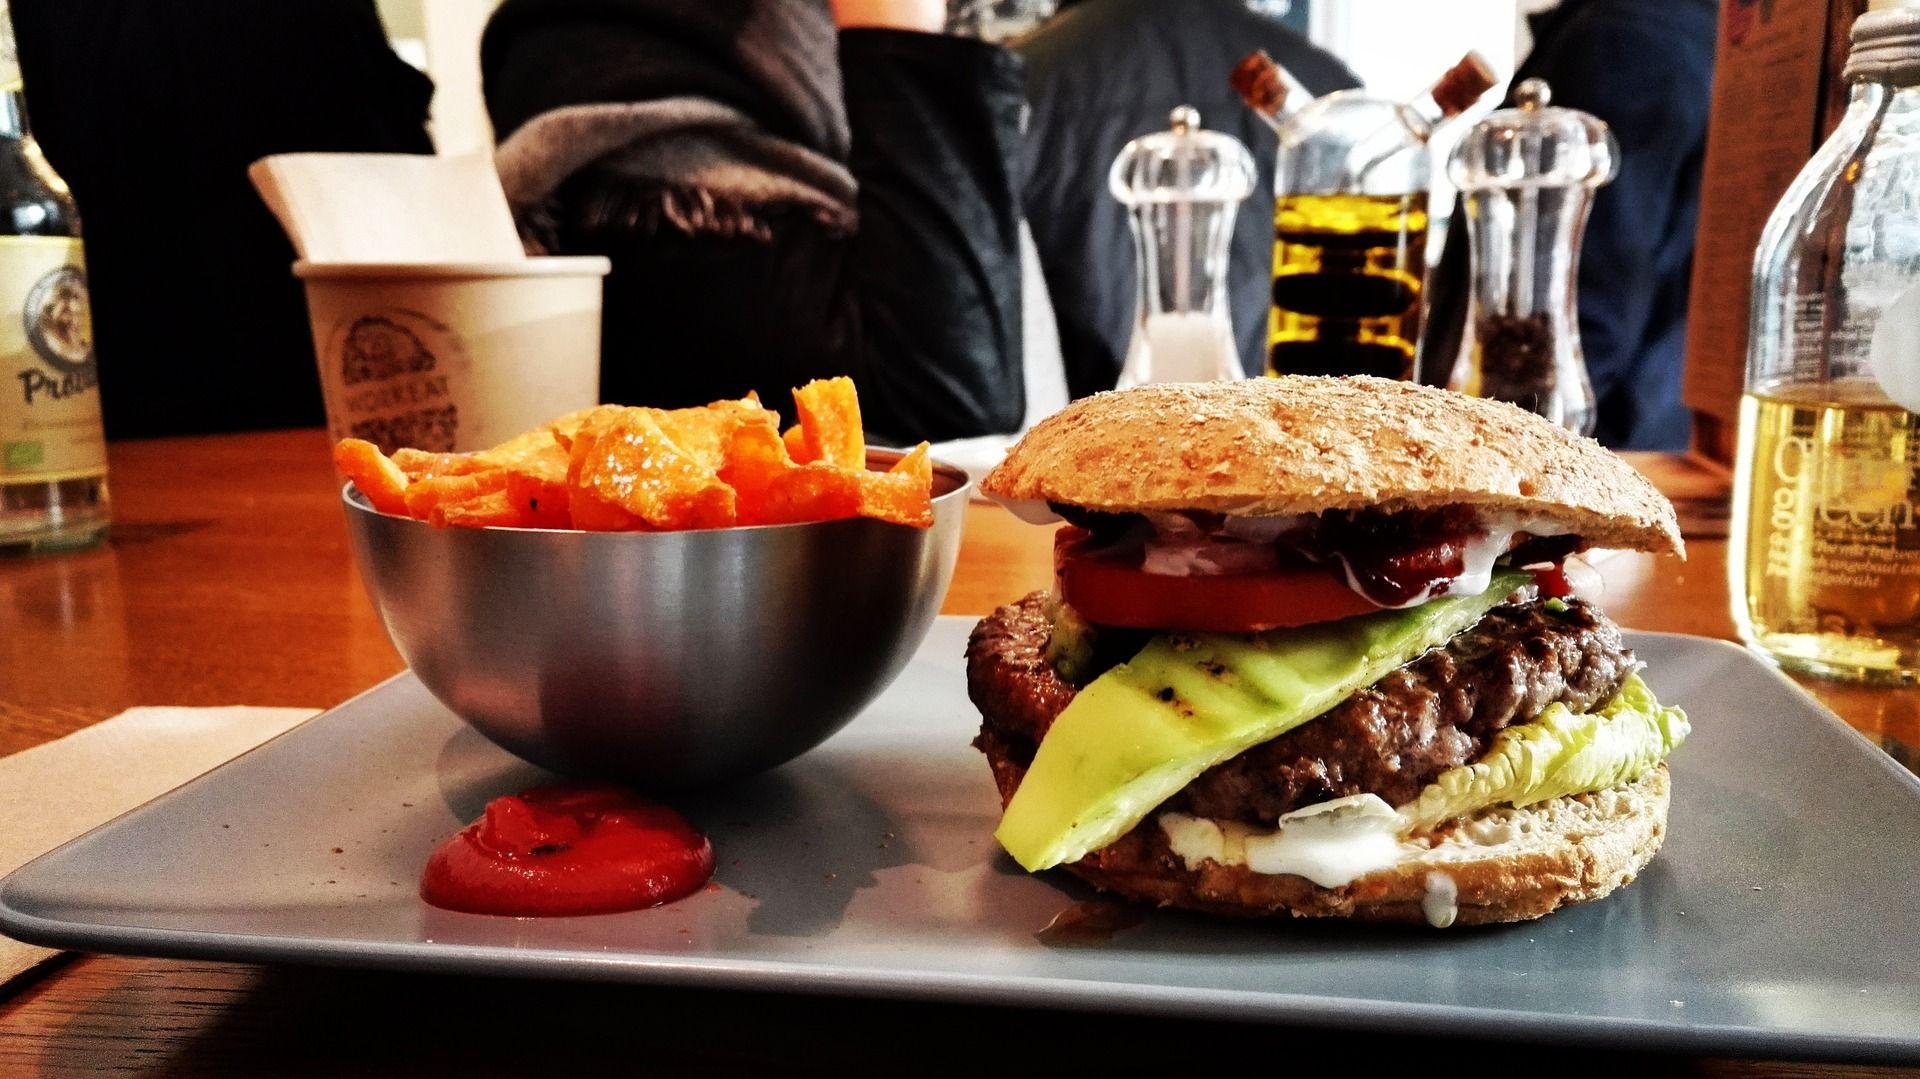 Nuestras hamburguesas: Carta  de Al Taglio Palma - Cavallino Rosso